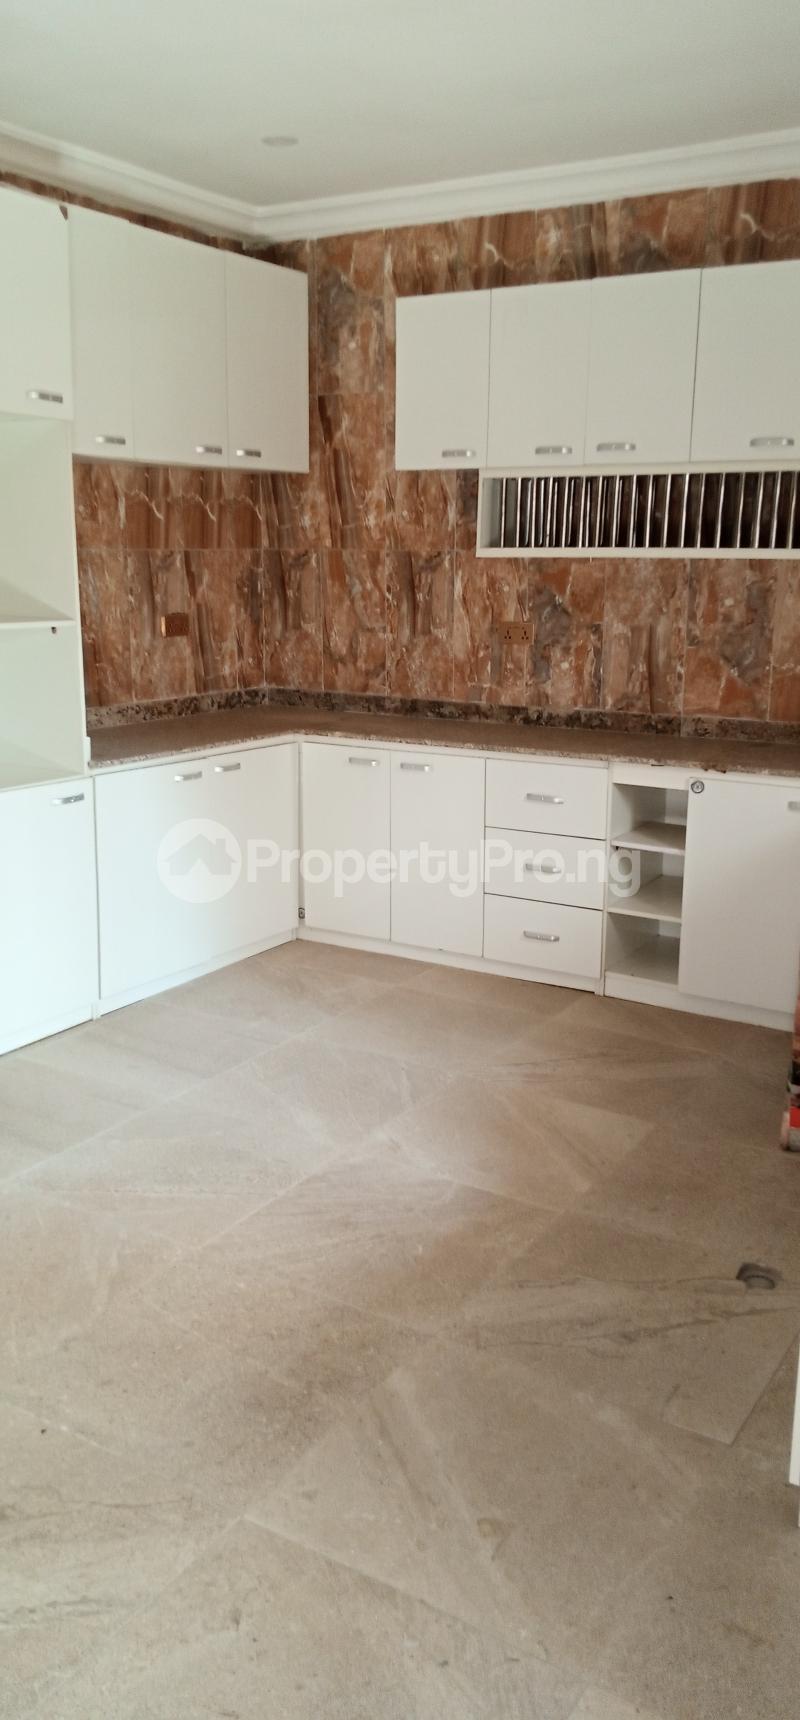 4 bedroom Semi Detached Duplex House for sale ... Jakande Lekki Lagos - 1